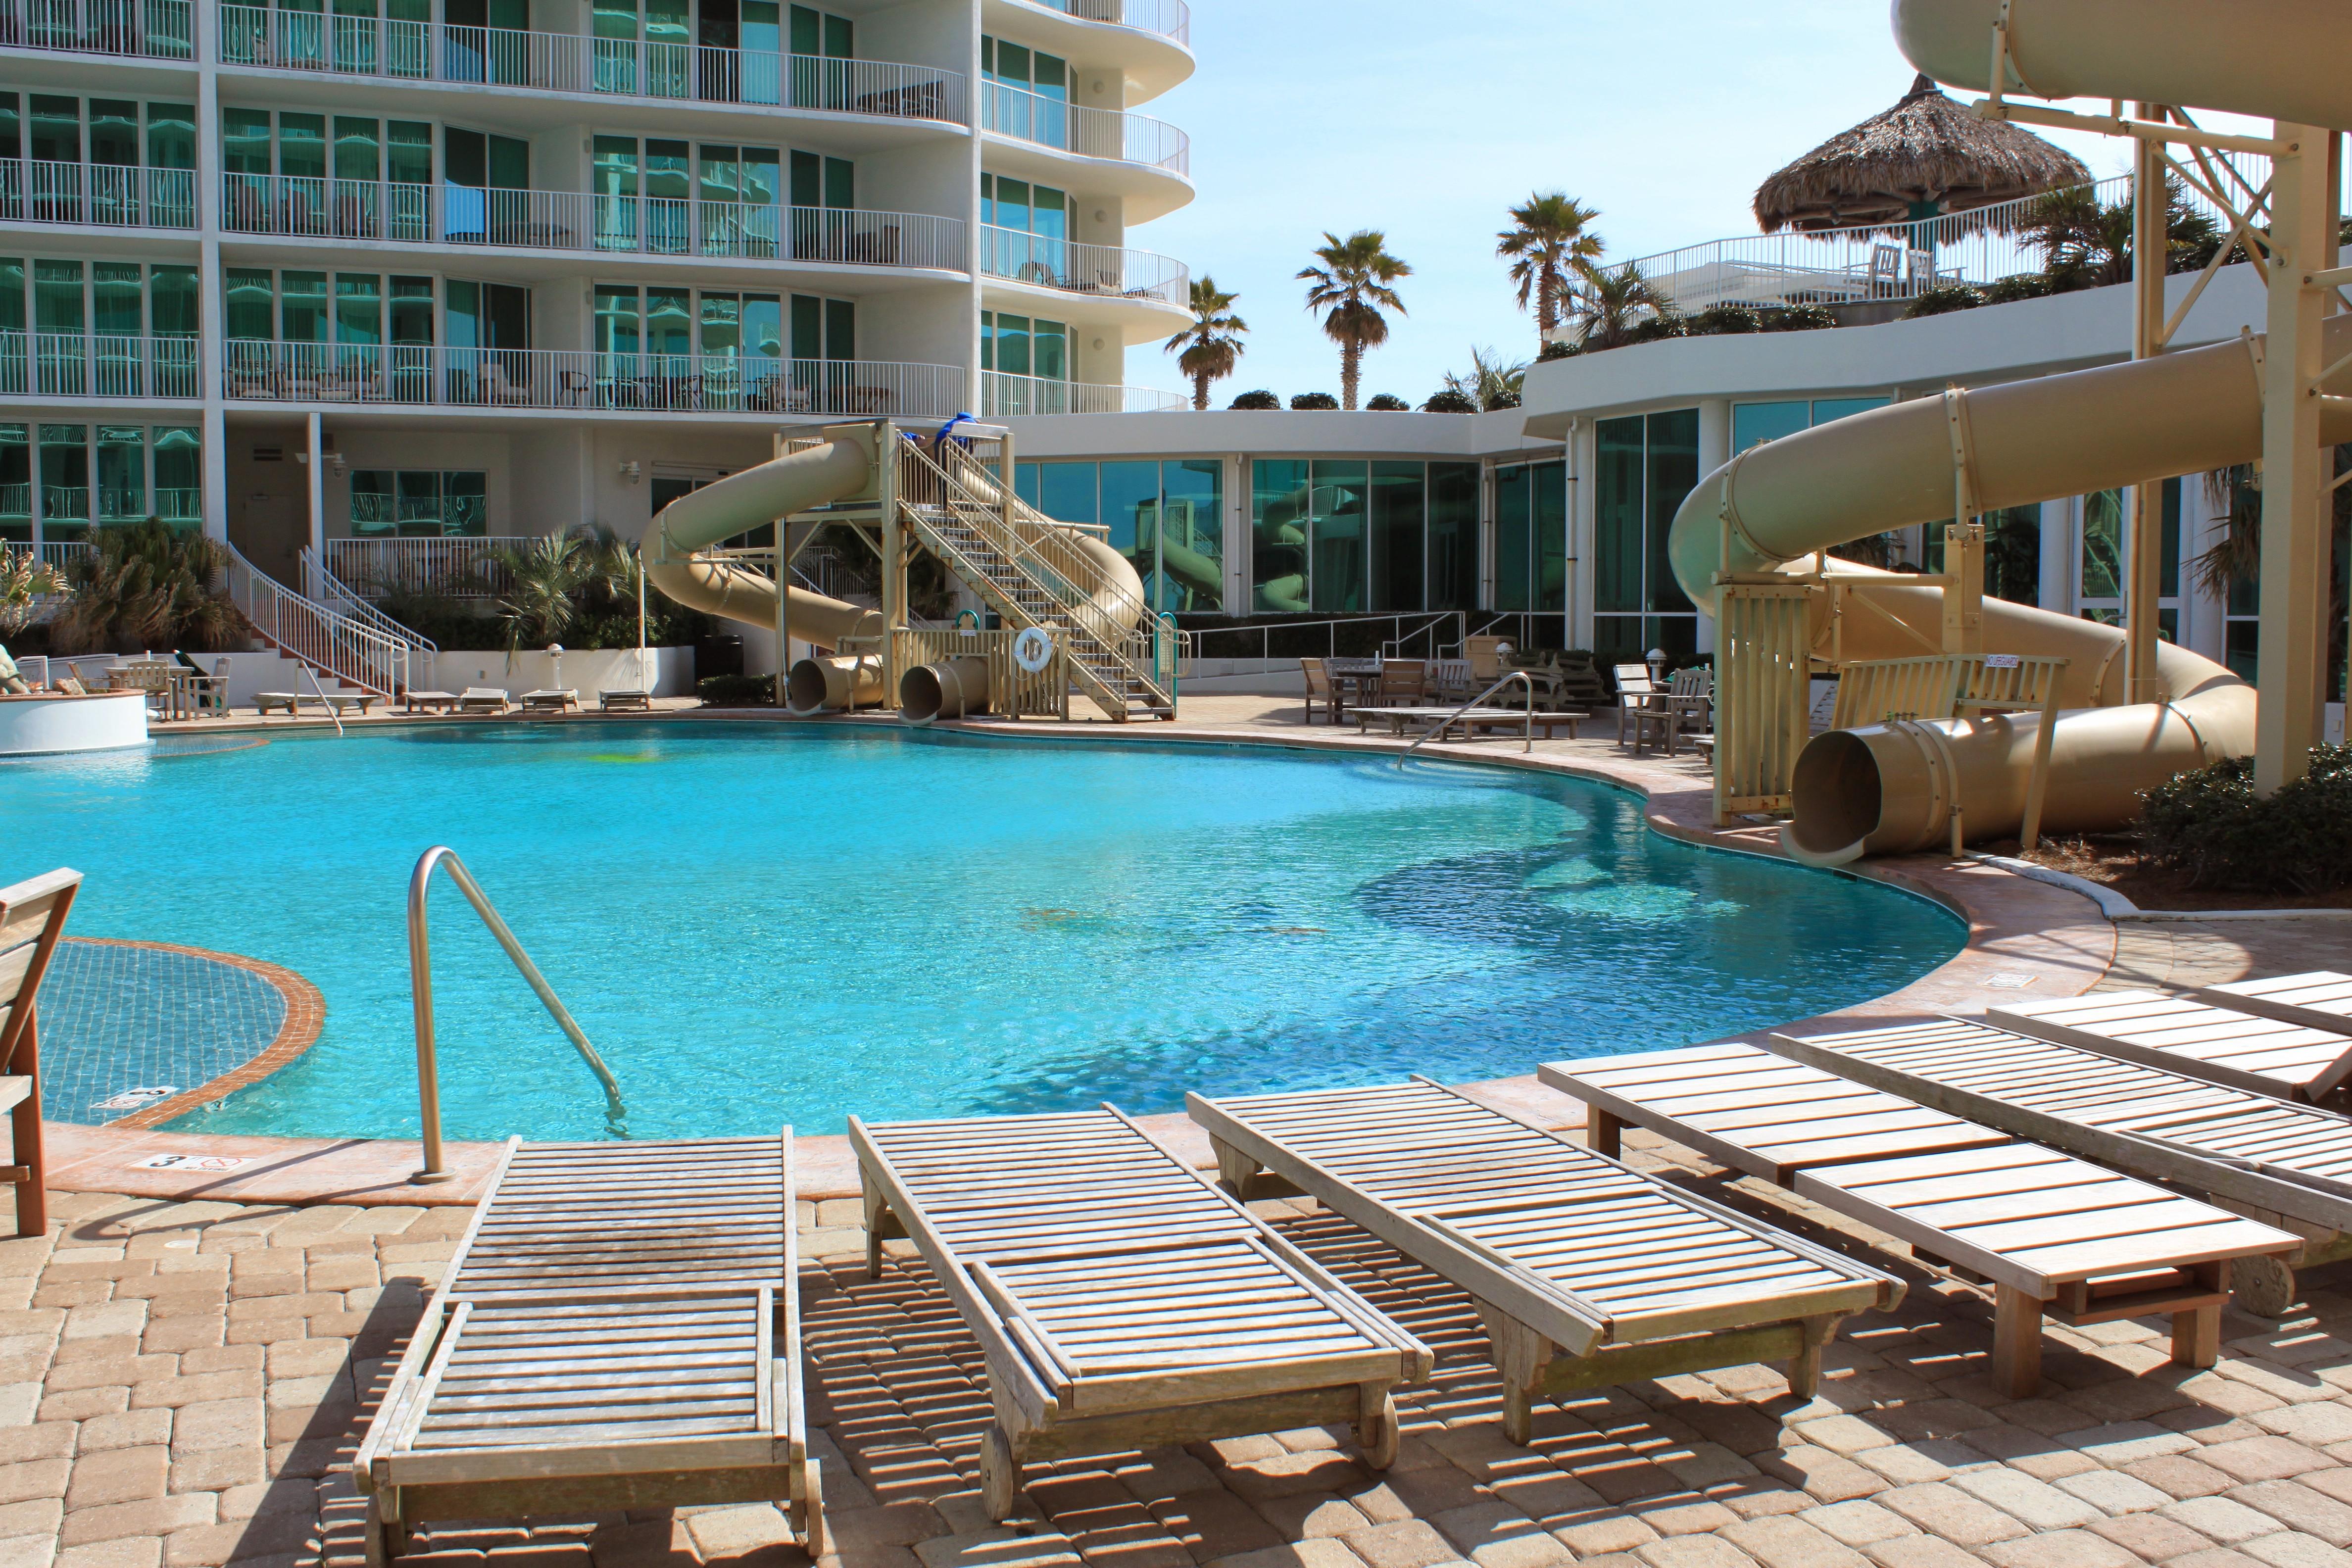 Beach Resort Rentals  Caribe C1212  Luxury Coastal Vacations